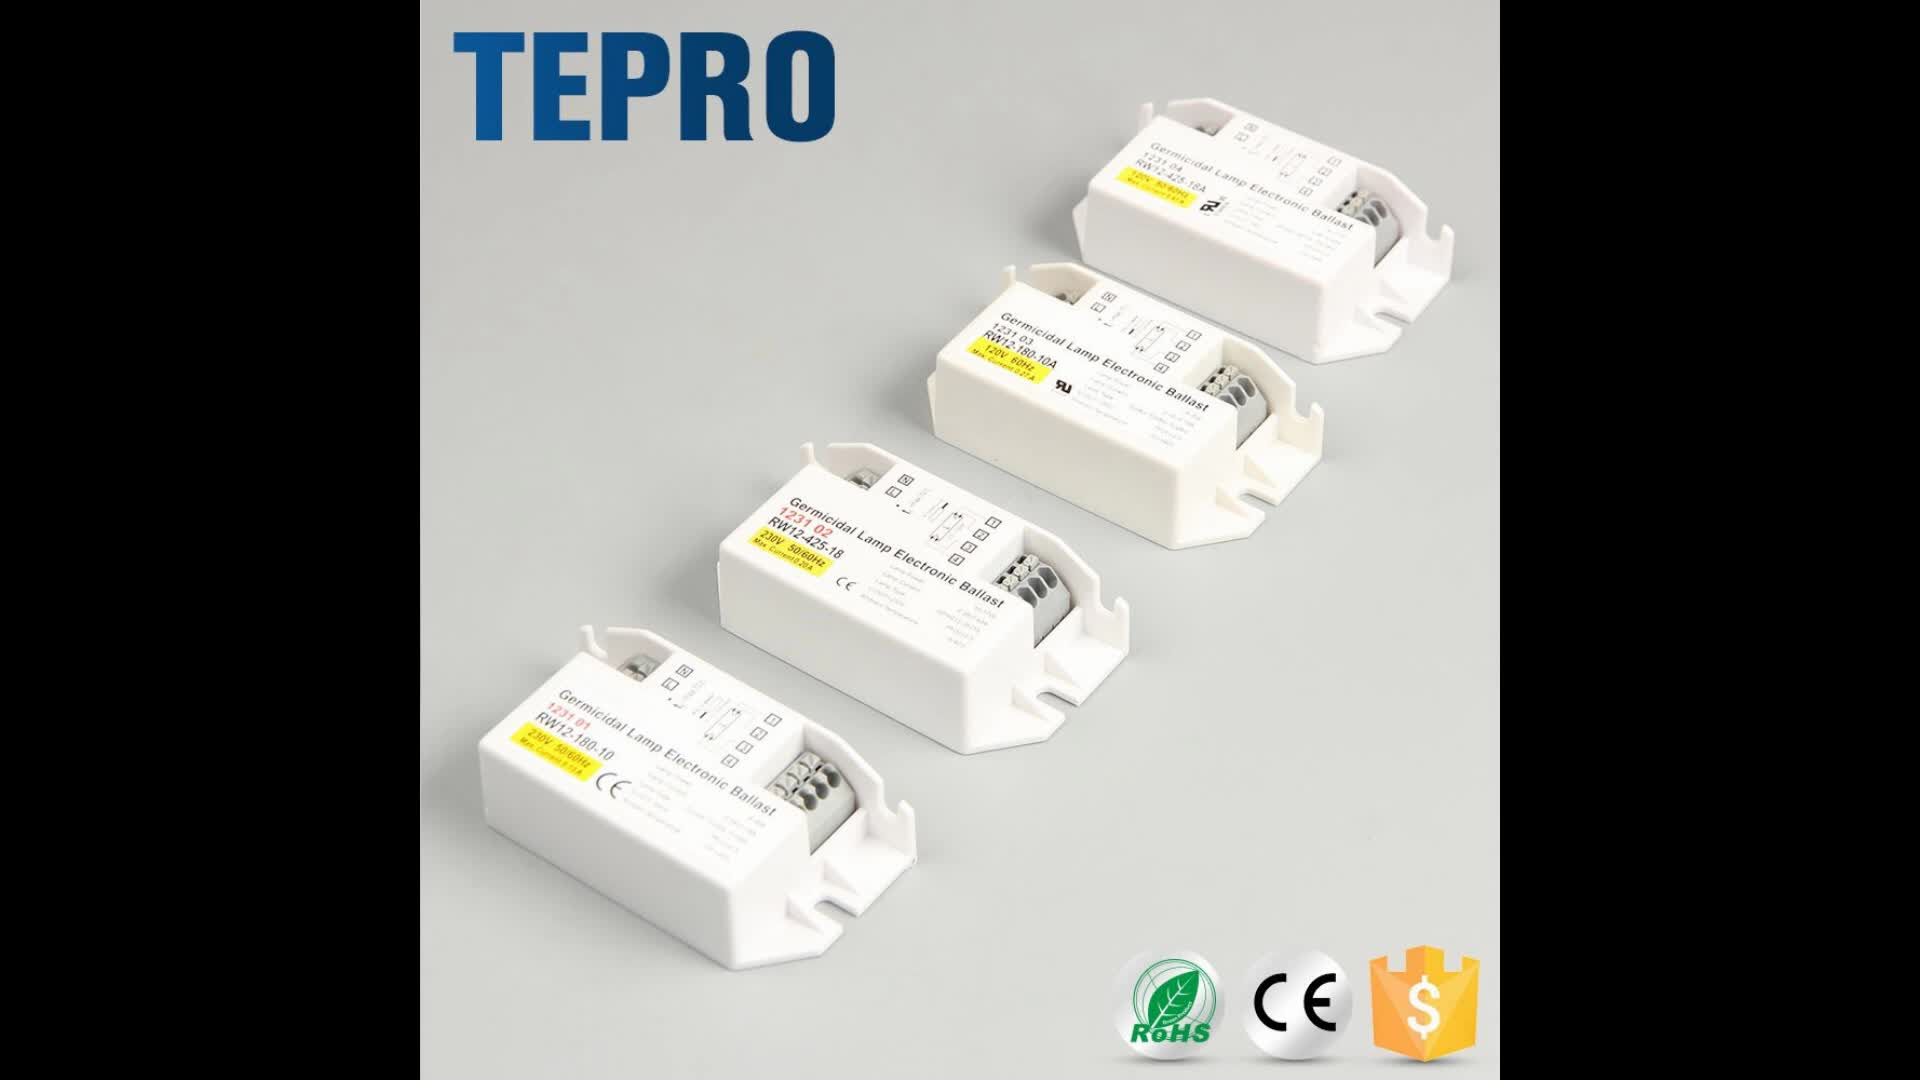 T5 T8 Uv-C Germicidal Light Electronic Ballasts 10W 30W 36W 40W 55W Uvc Lamp Electronic Ballast For 58W UV Lamp